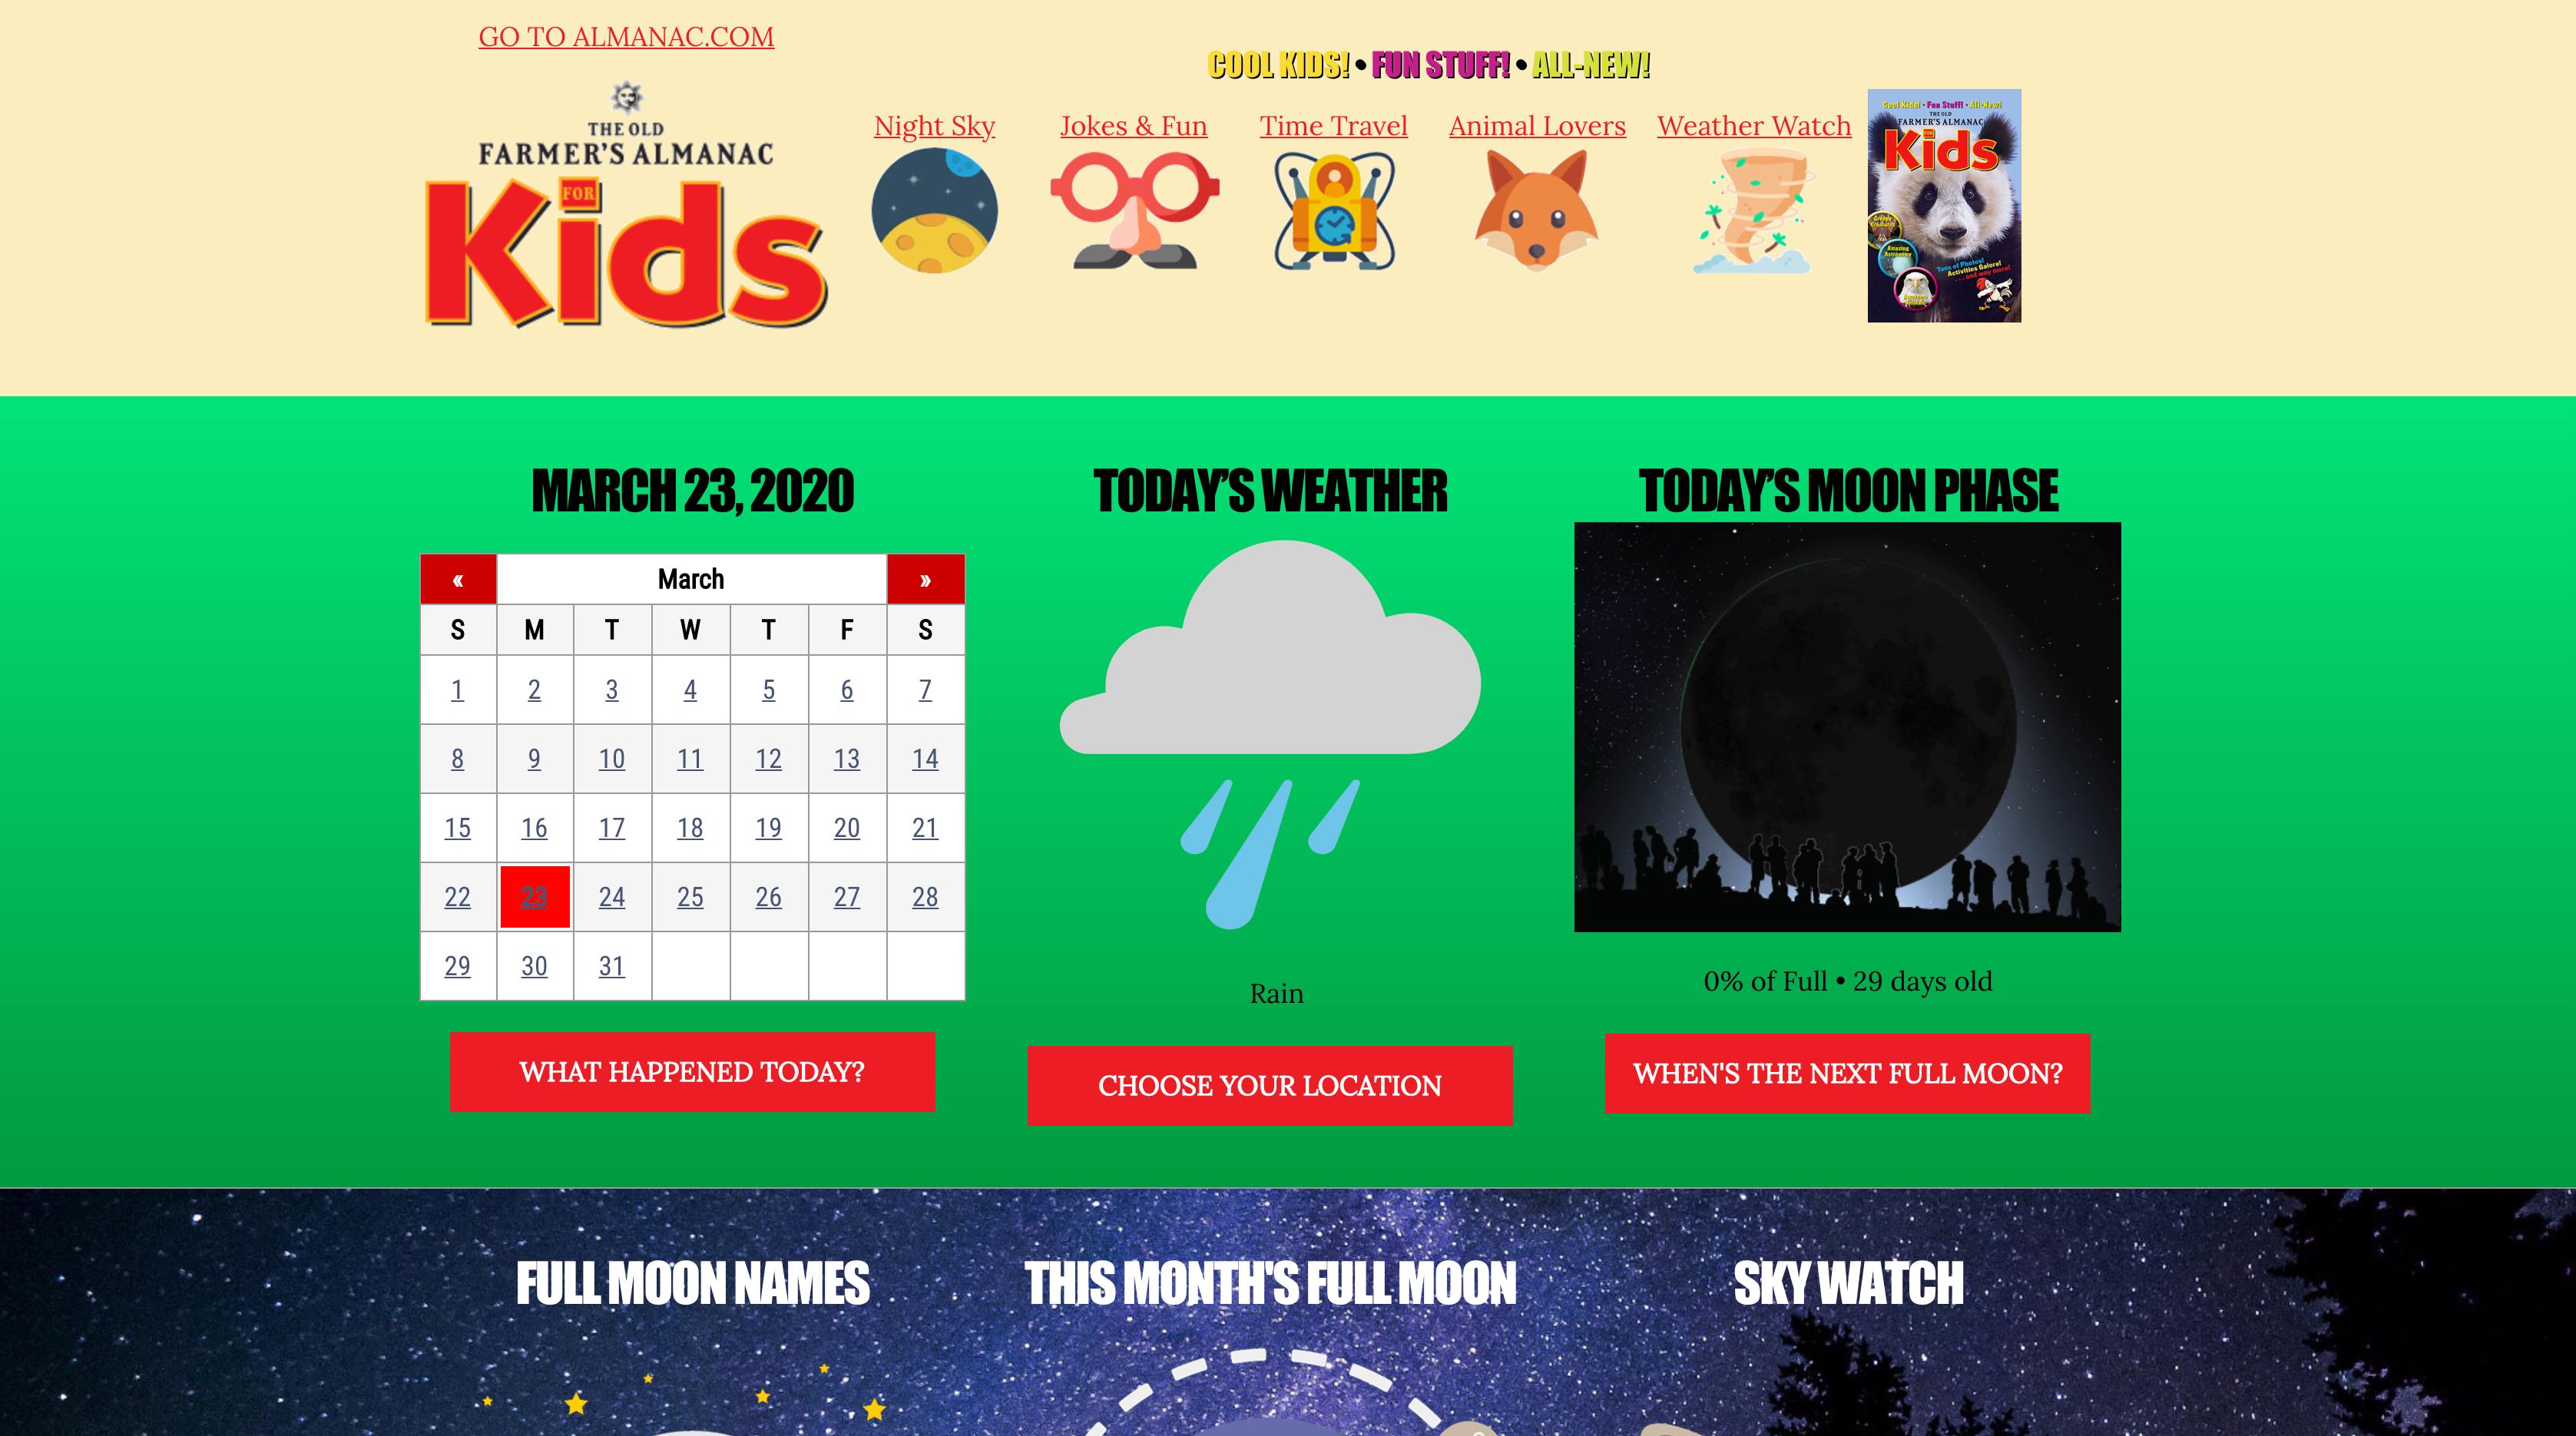 Screenshot of the Old Farmer's Almanac website for kids.